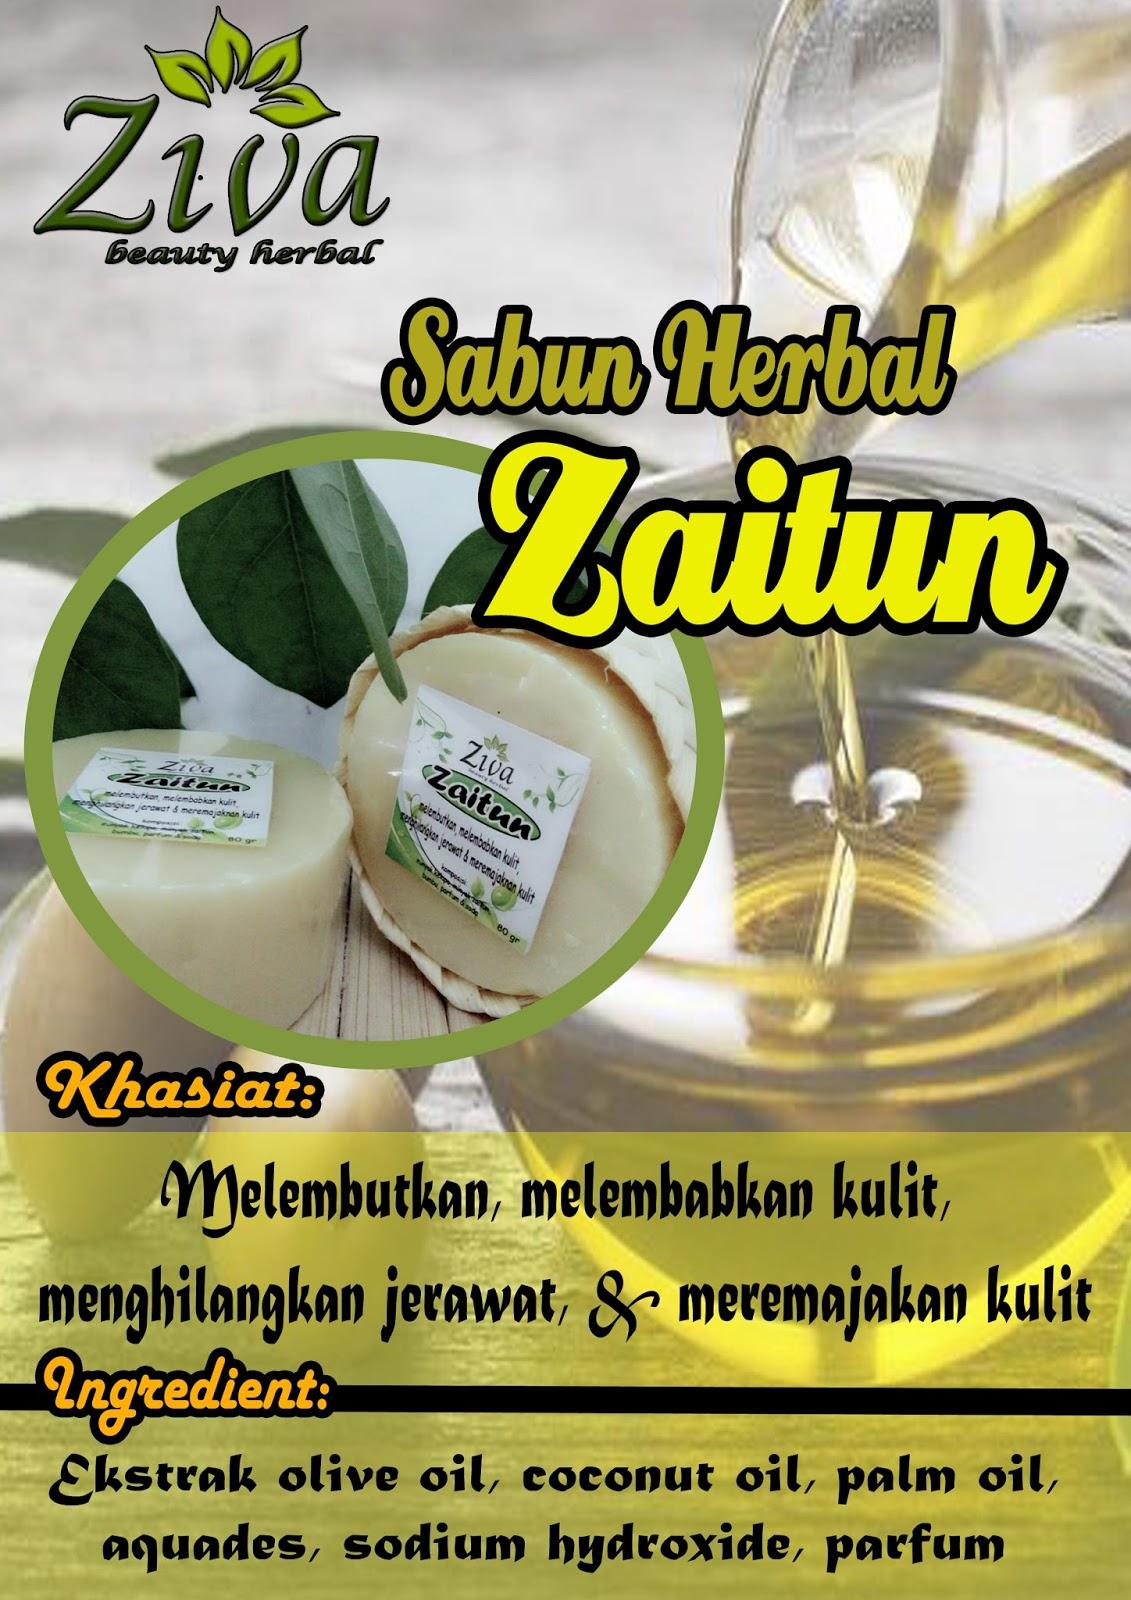 Sabun Ziva Herbal Zaitun Hotel Beauty